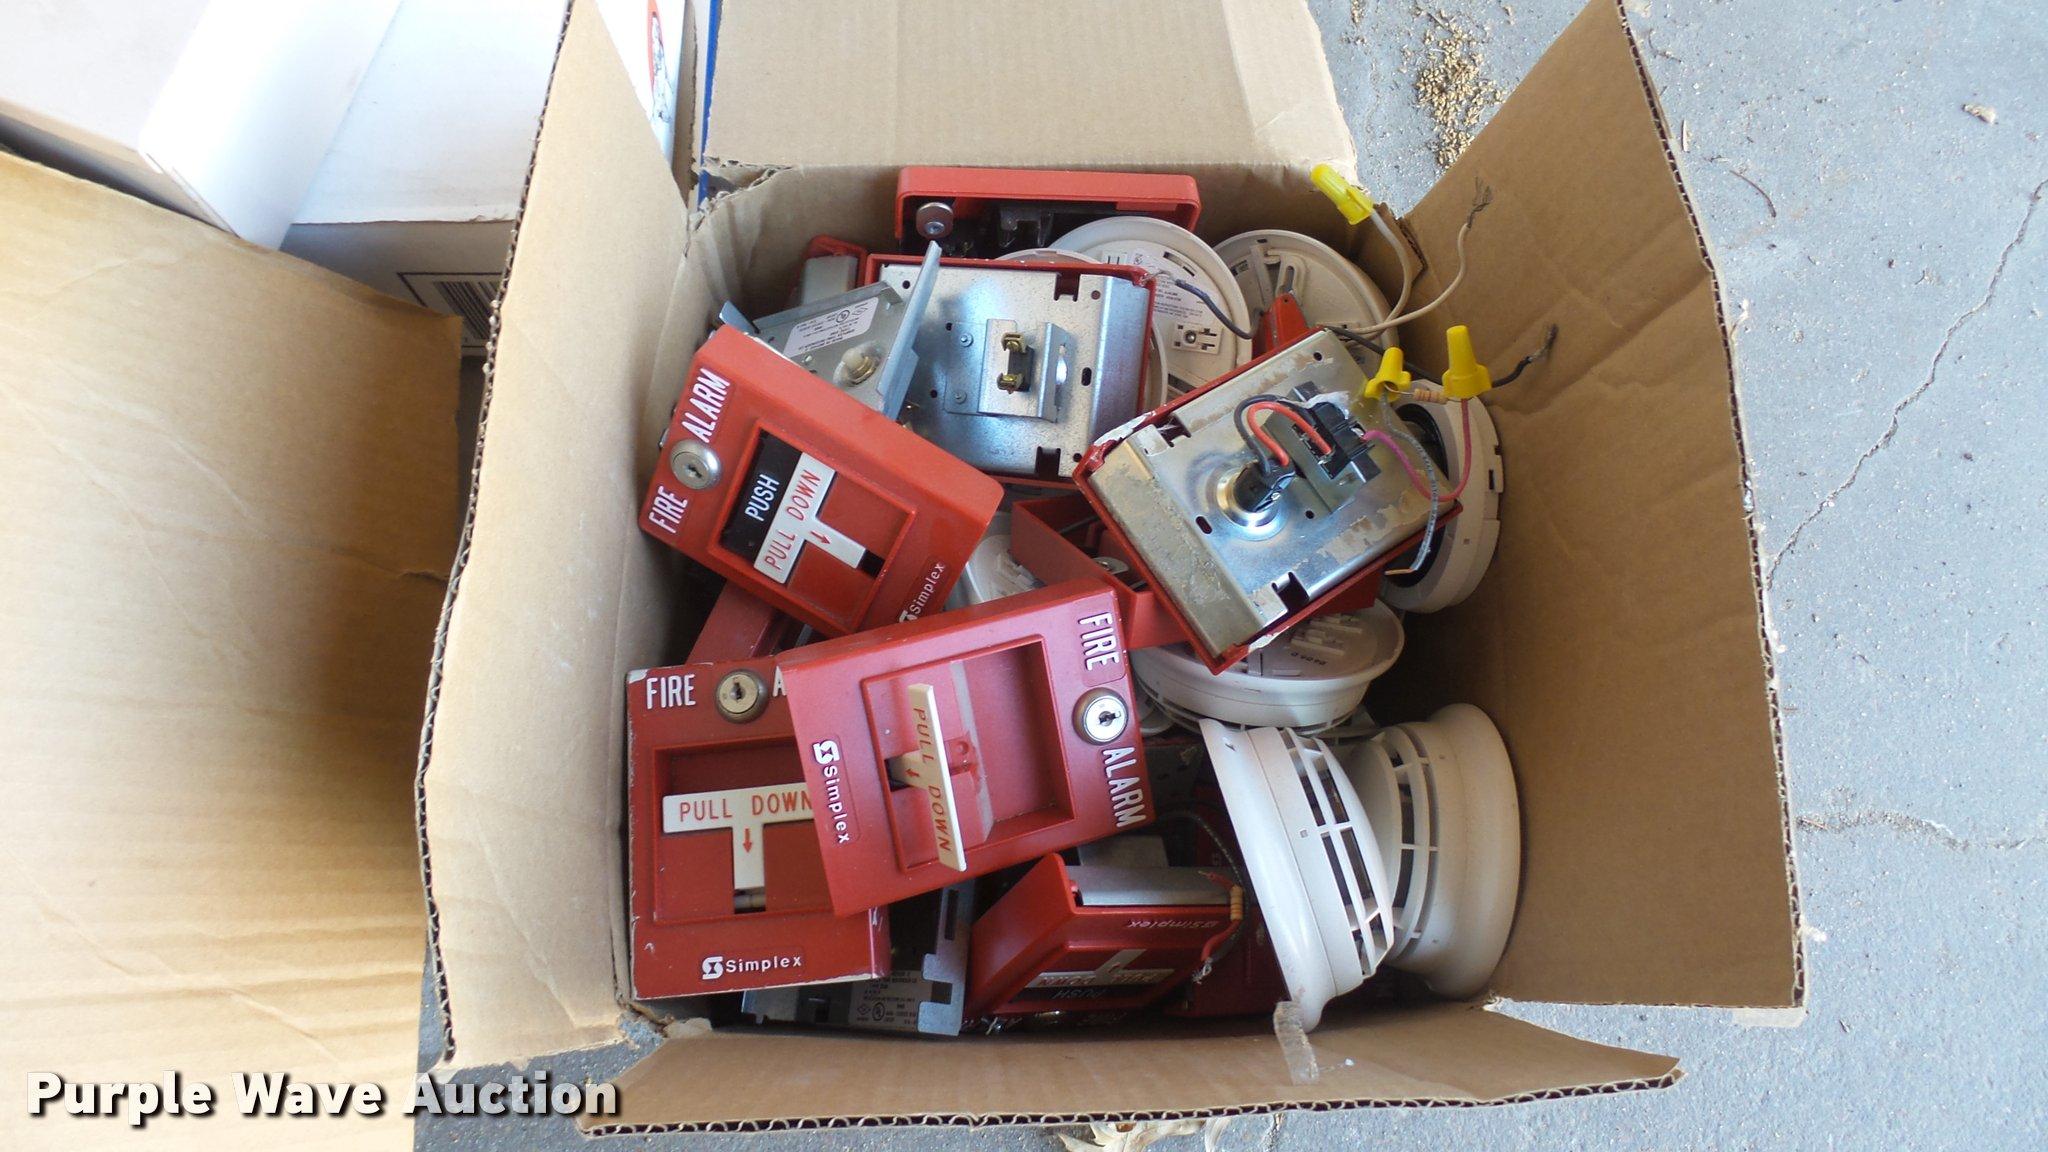 Simplex fire alarm system   Item DQ9772   SOLD! April 4 Gove